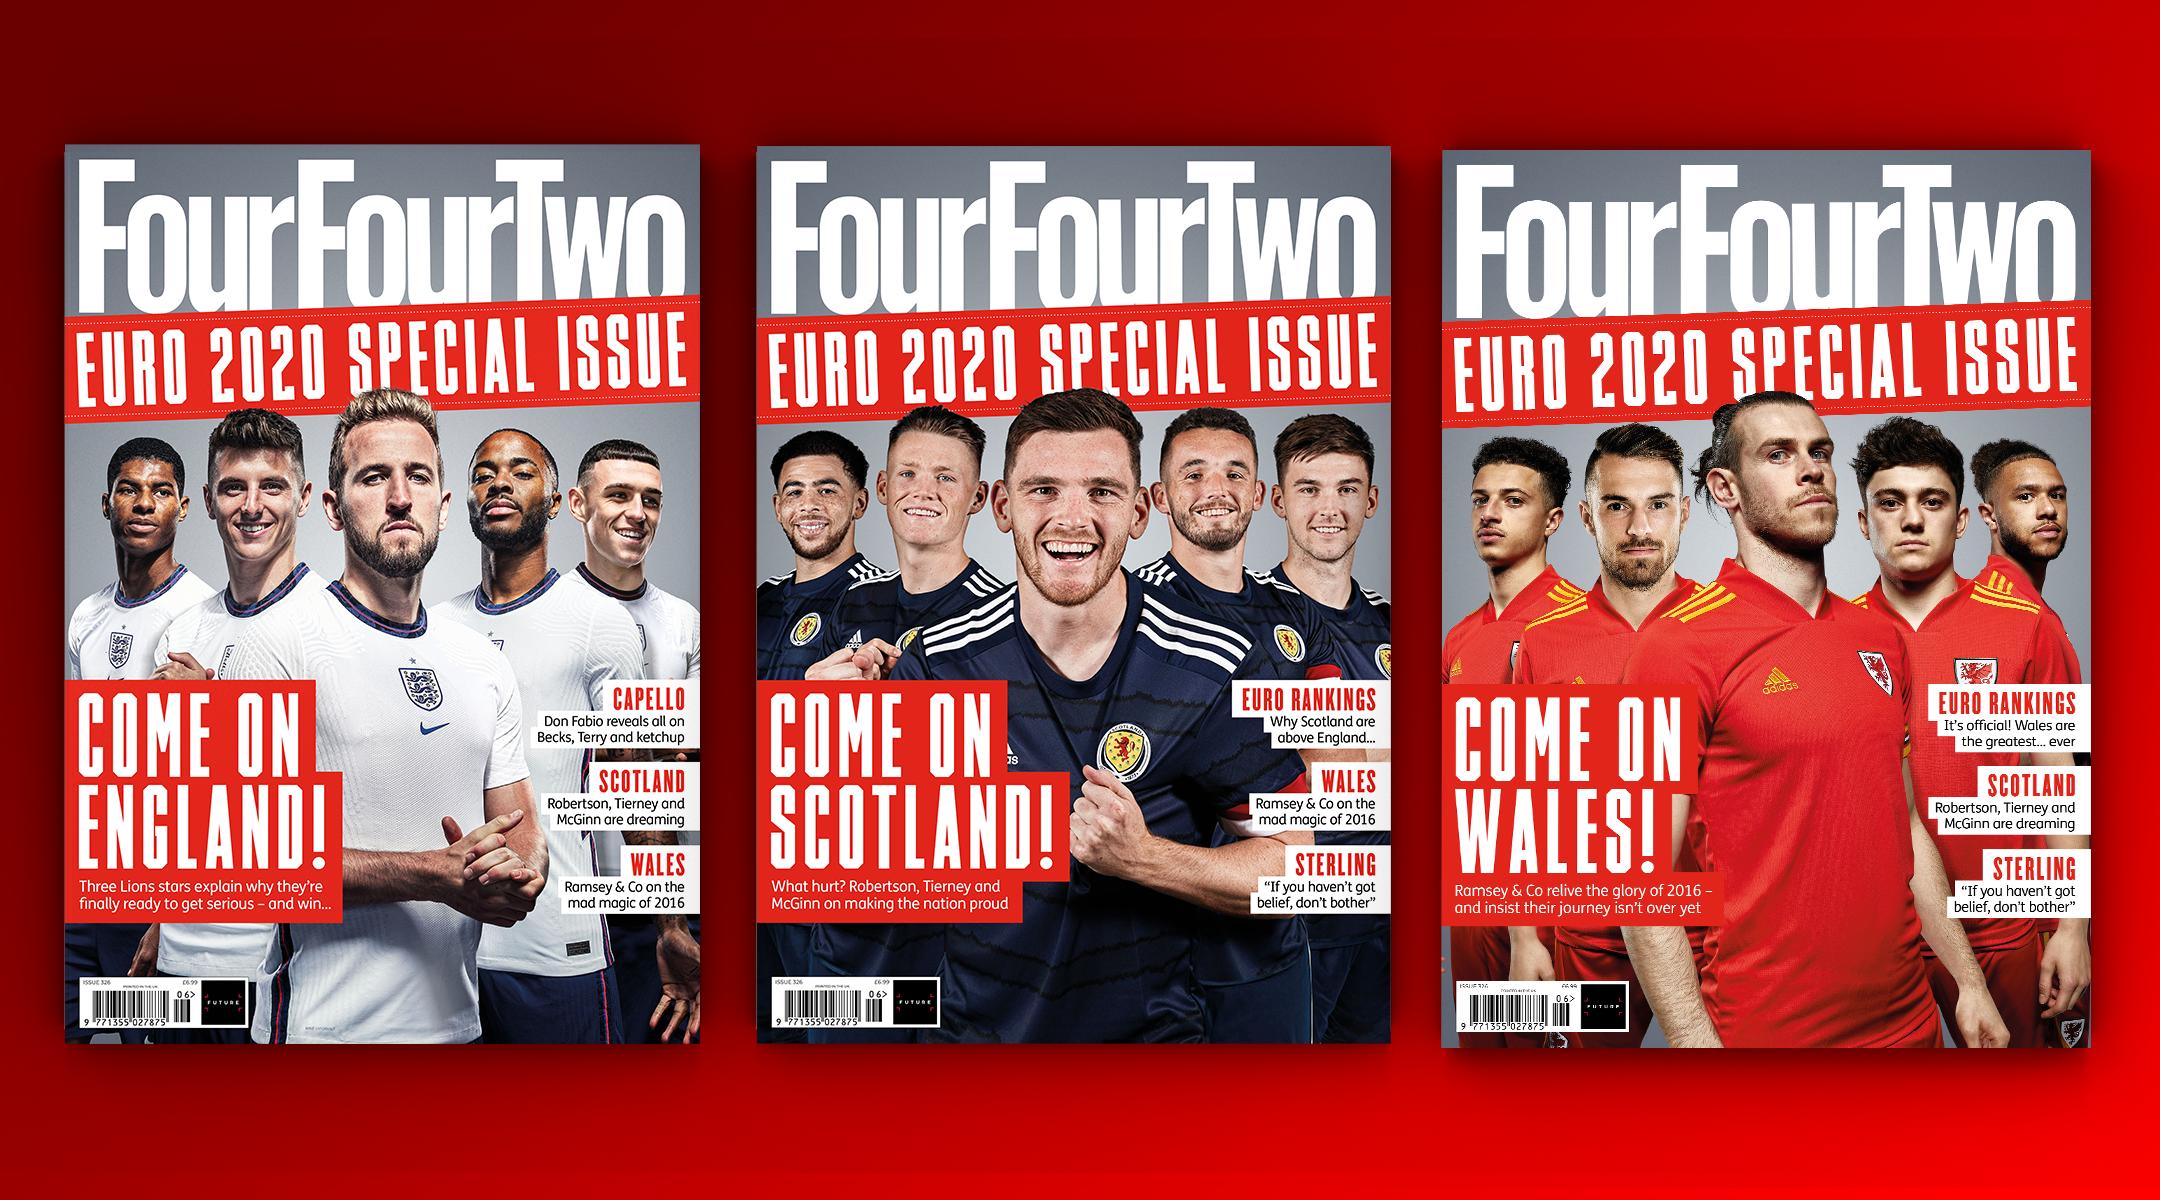 Euro 2020 issue, England, Scotland, Wales FourFourTwo